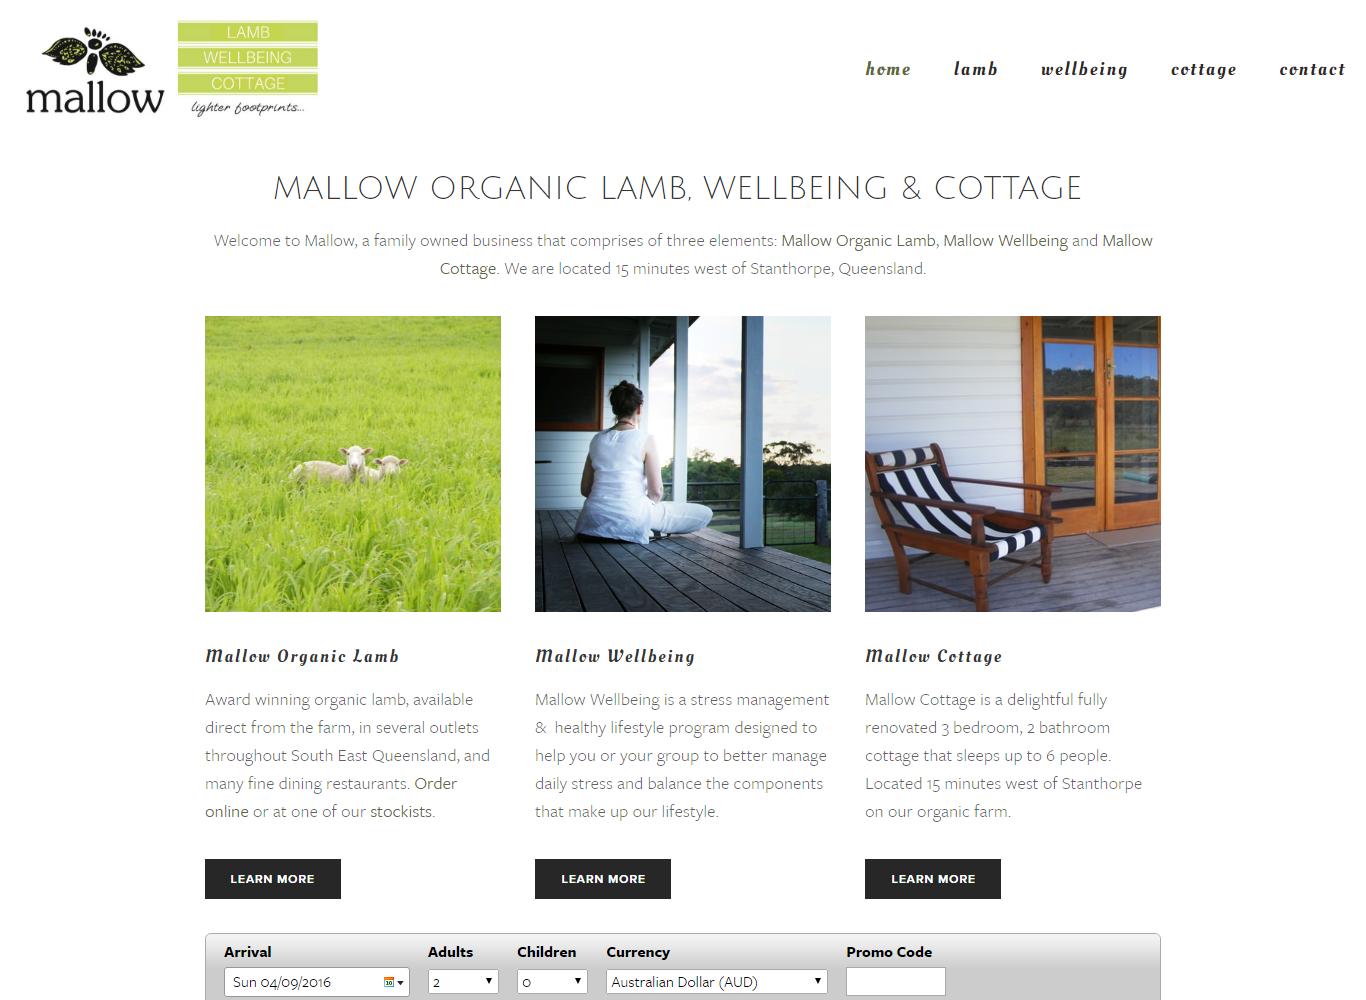 Mallow Organic Farm